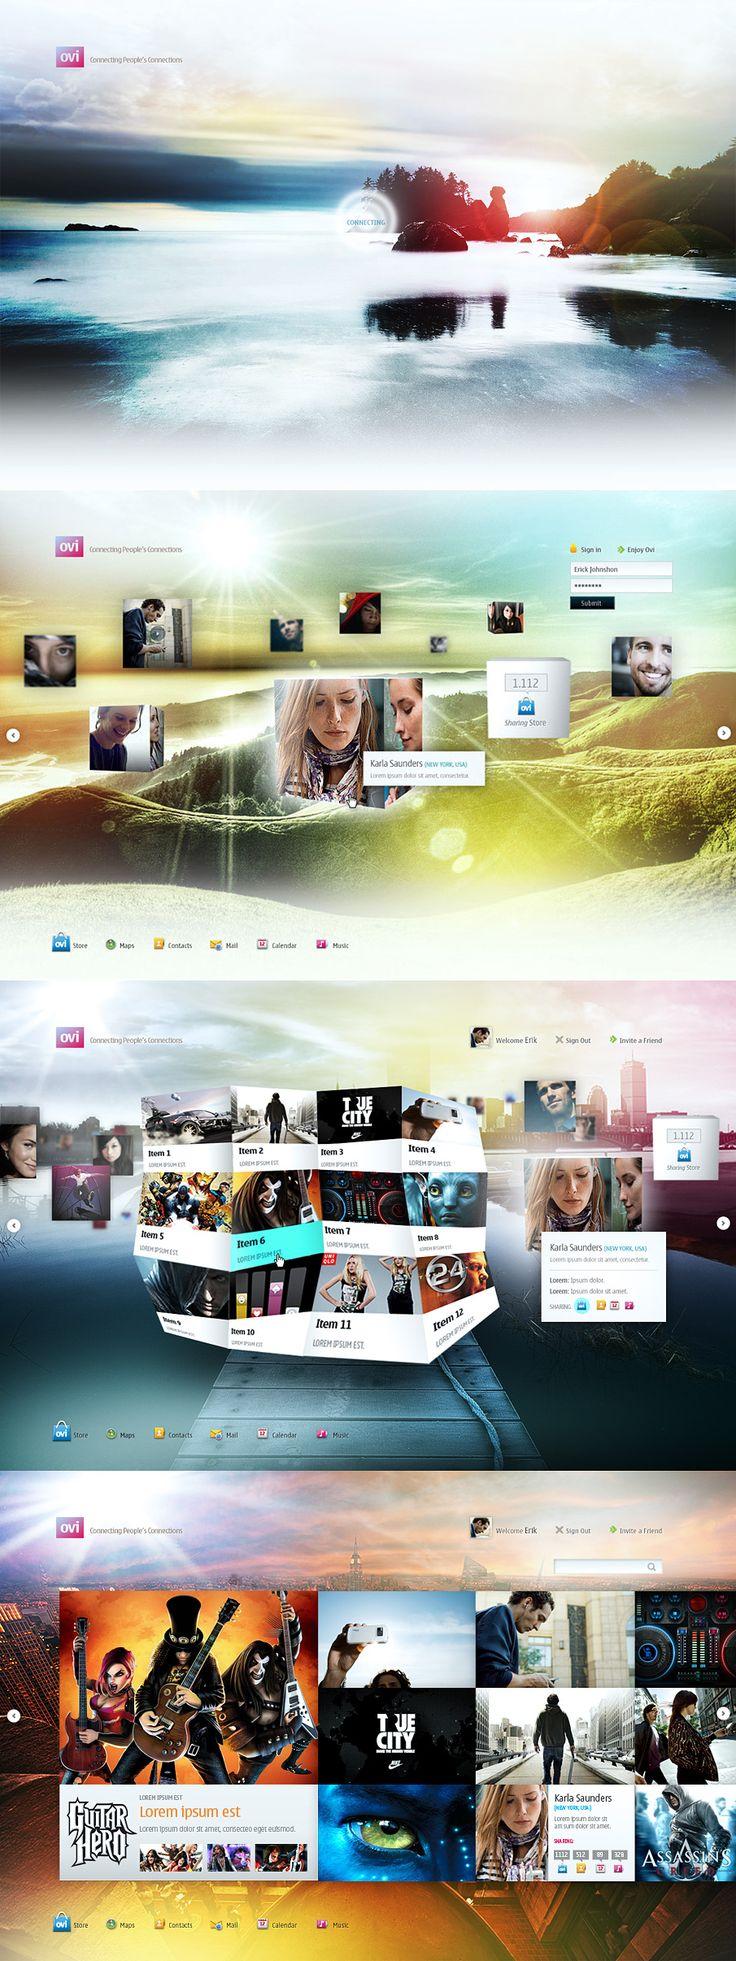 Placido Salazar | #webdesign #it #web #design #layout #userinterface #website #webdesign <<< repinned by an #advertising #agency from #Hamburg / #Germany - www.BlickeDeeler.de | Follow us on www.facebook.com/BlickeDeeler